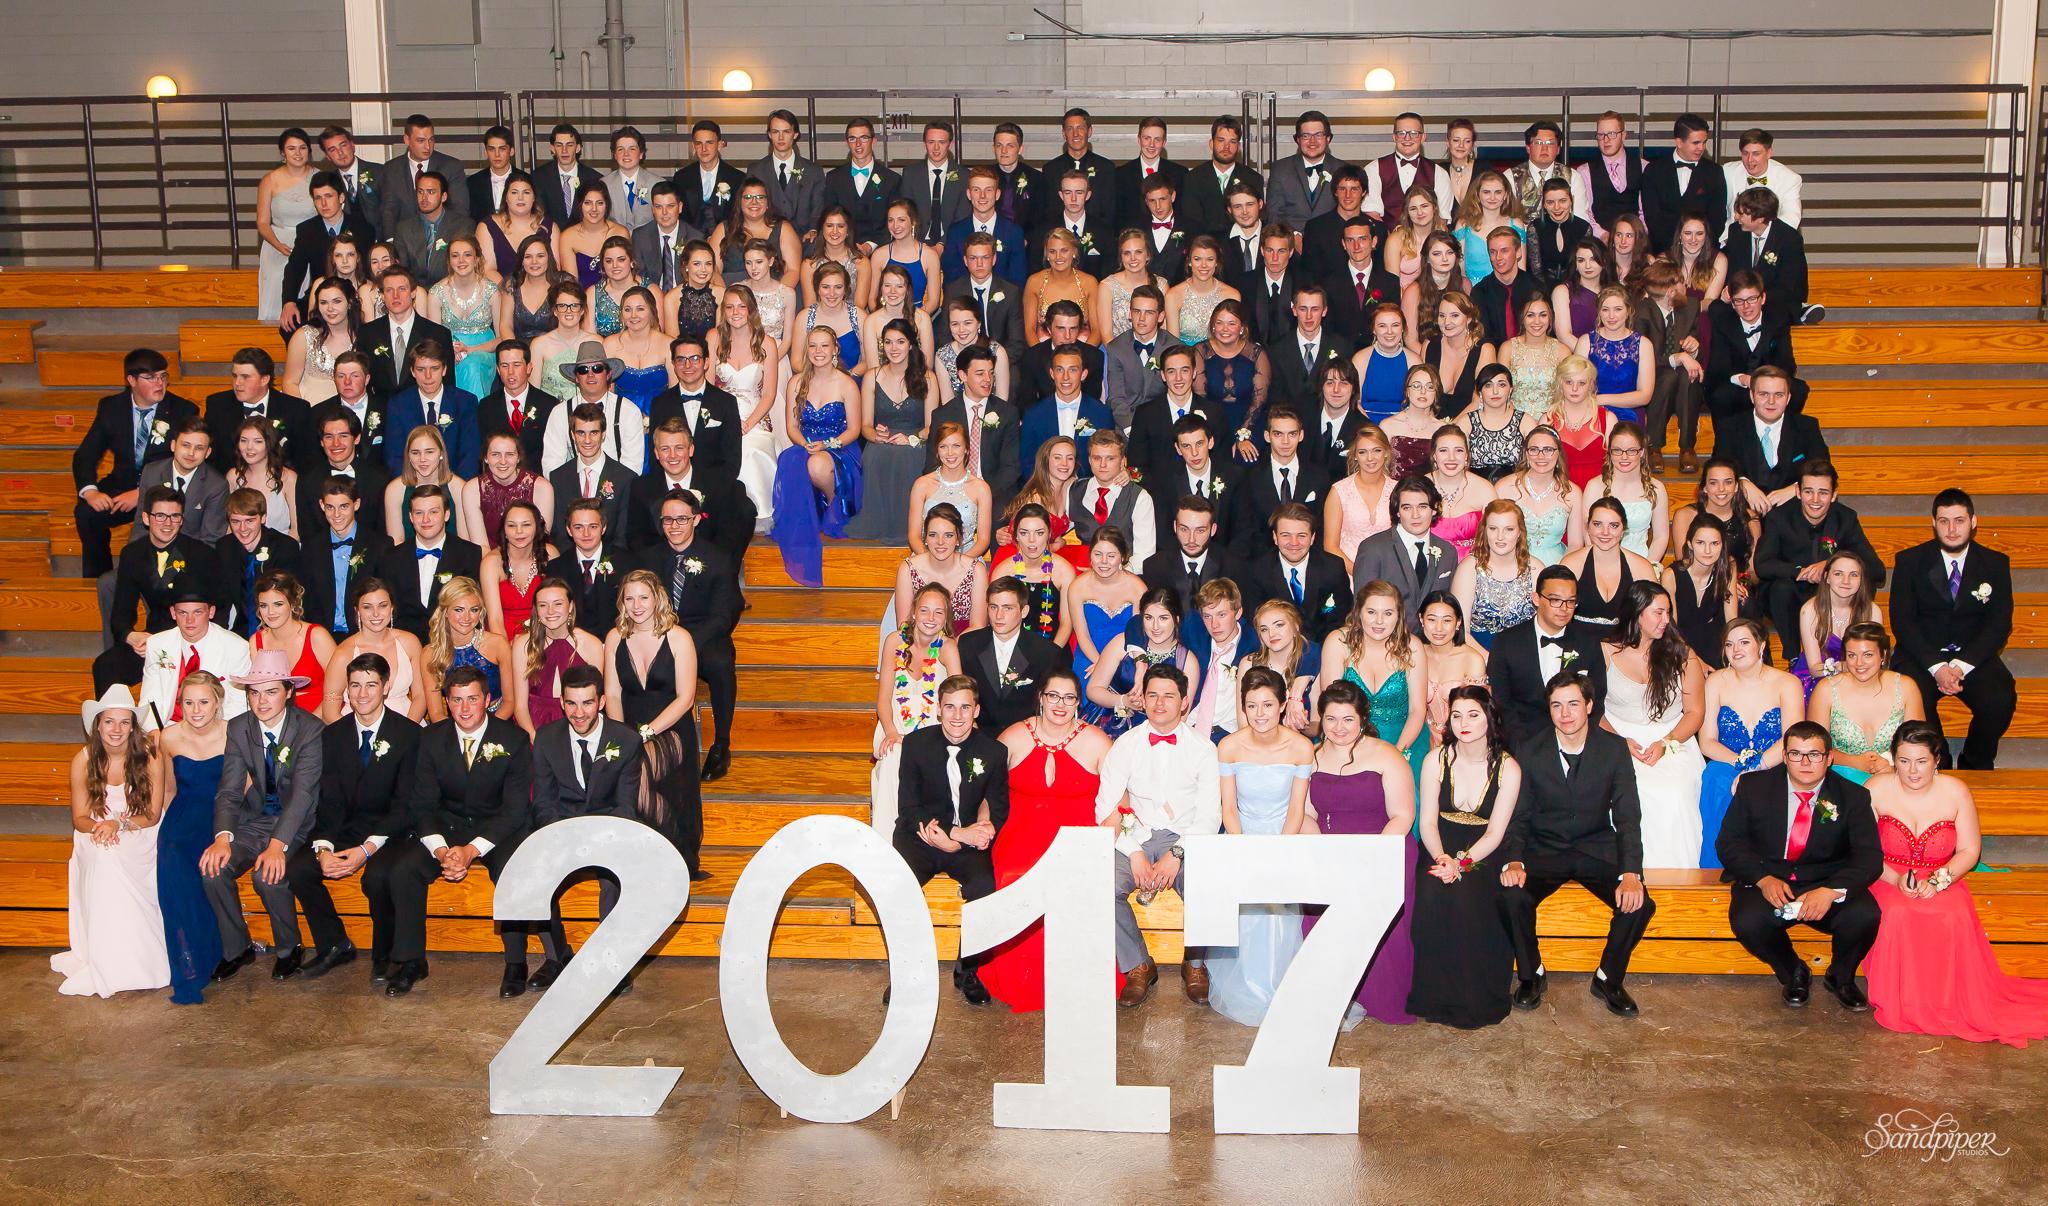 bluefield prom 2017